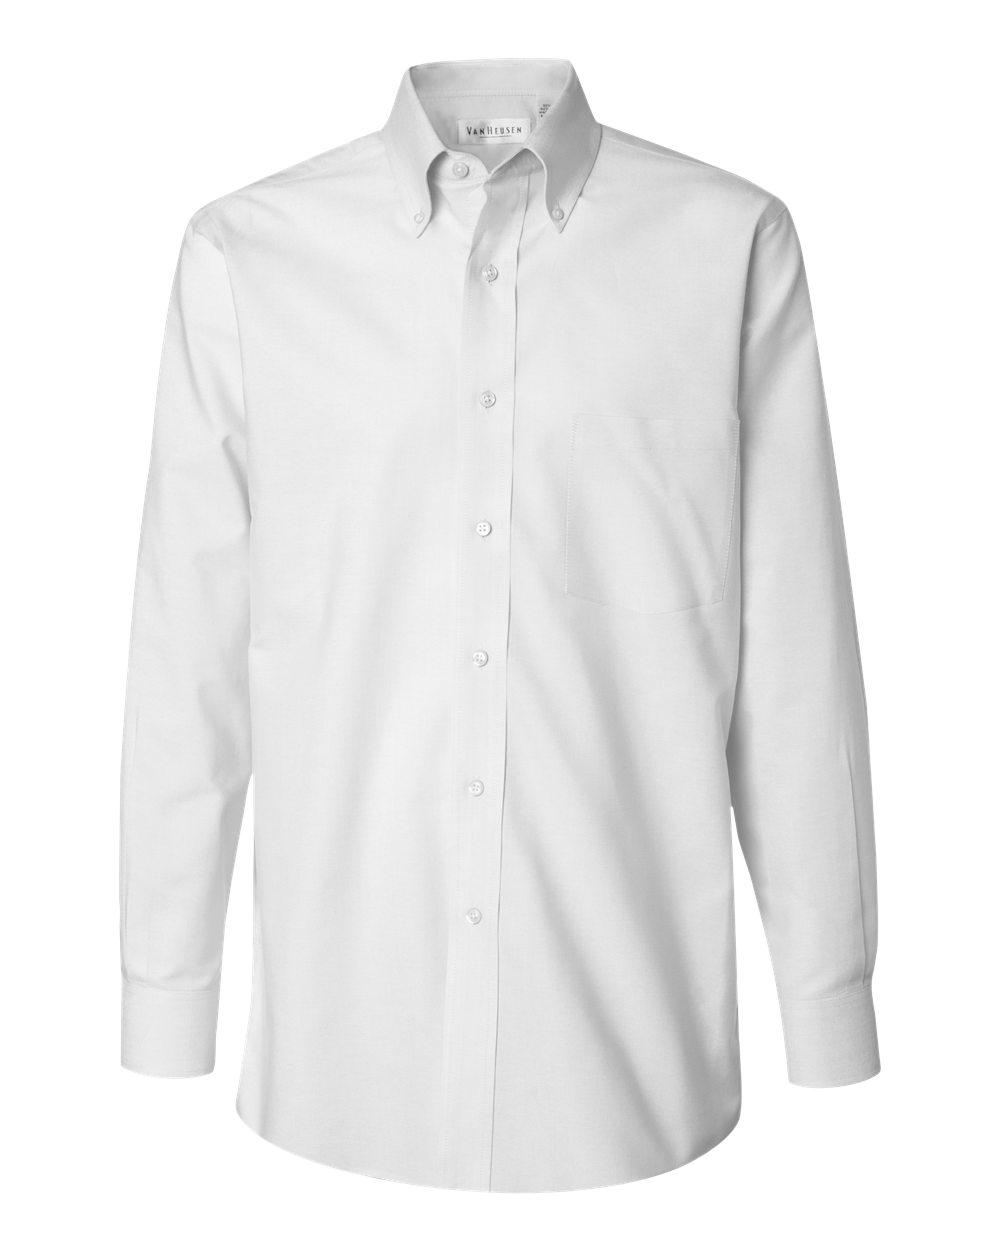 Van Heusen 13v0067 Pinpoint Oxford Shirt Needen Usa